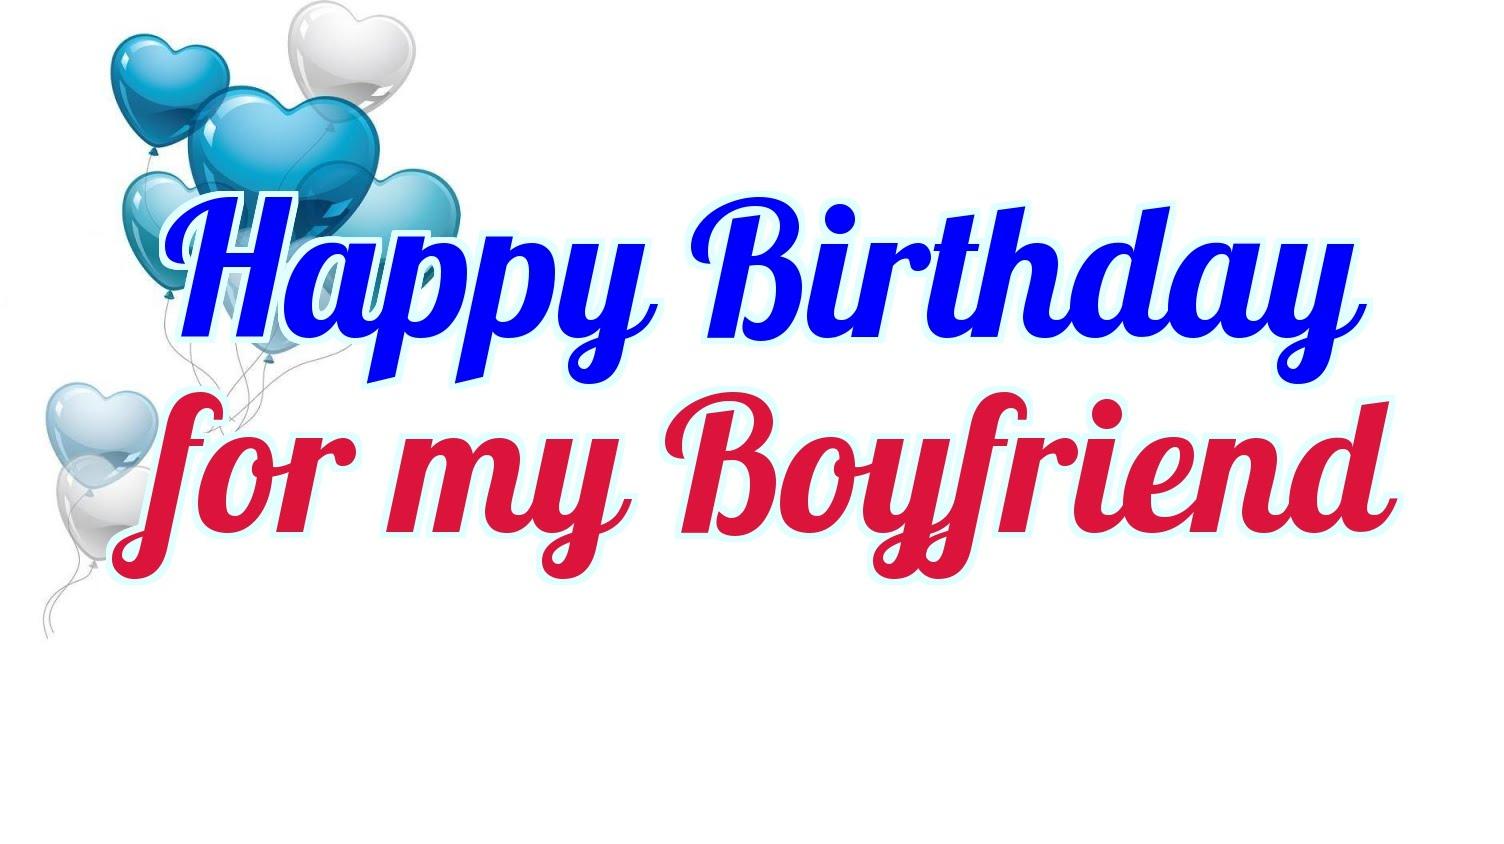 30+ Happy Birthday Wishes For My Love Boyfriend – Preet Kamal